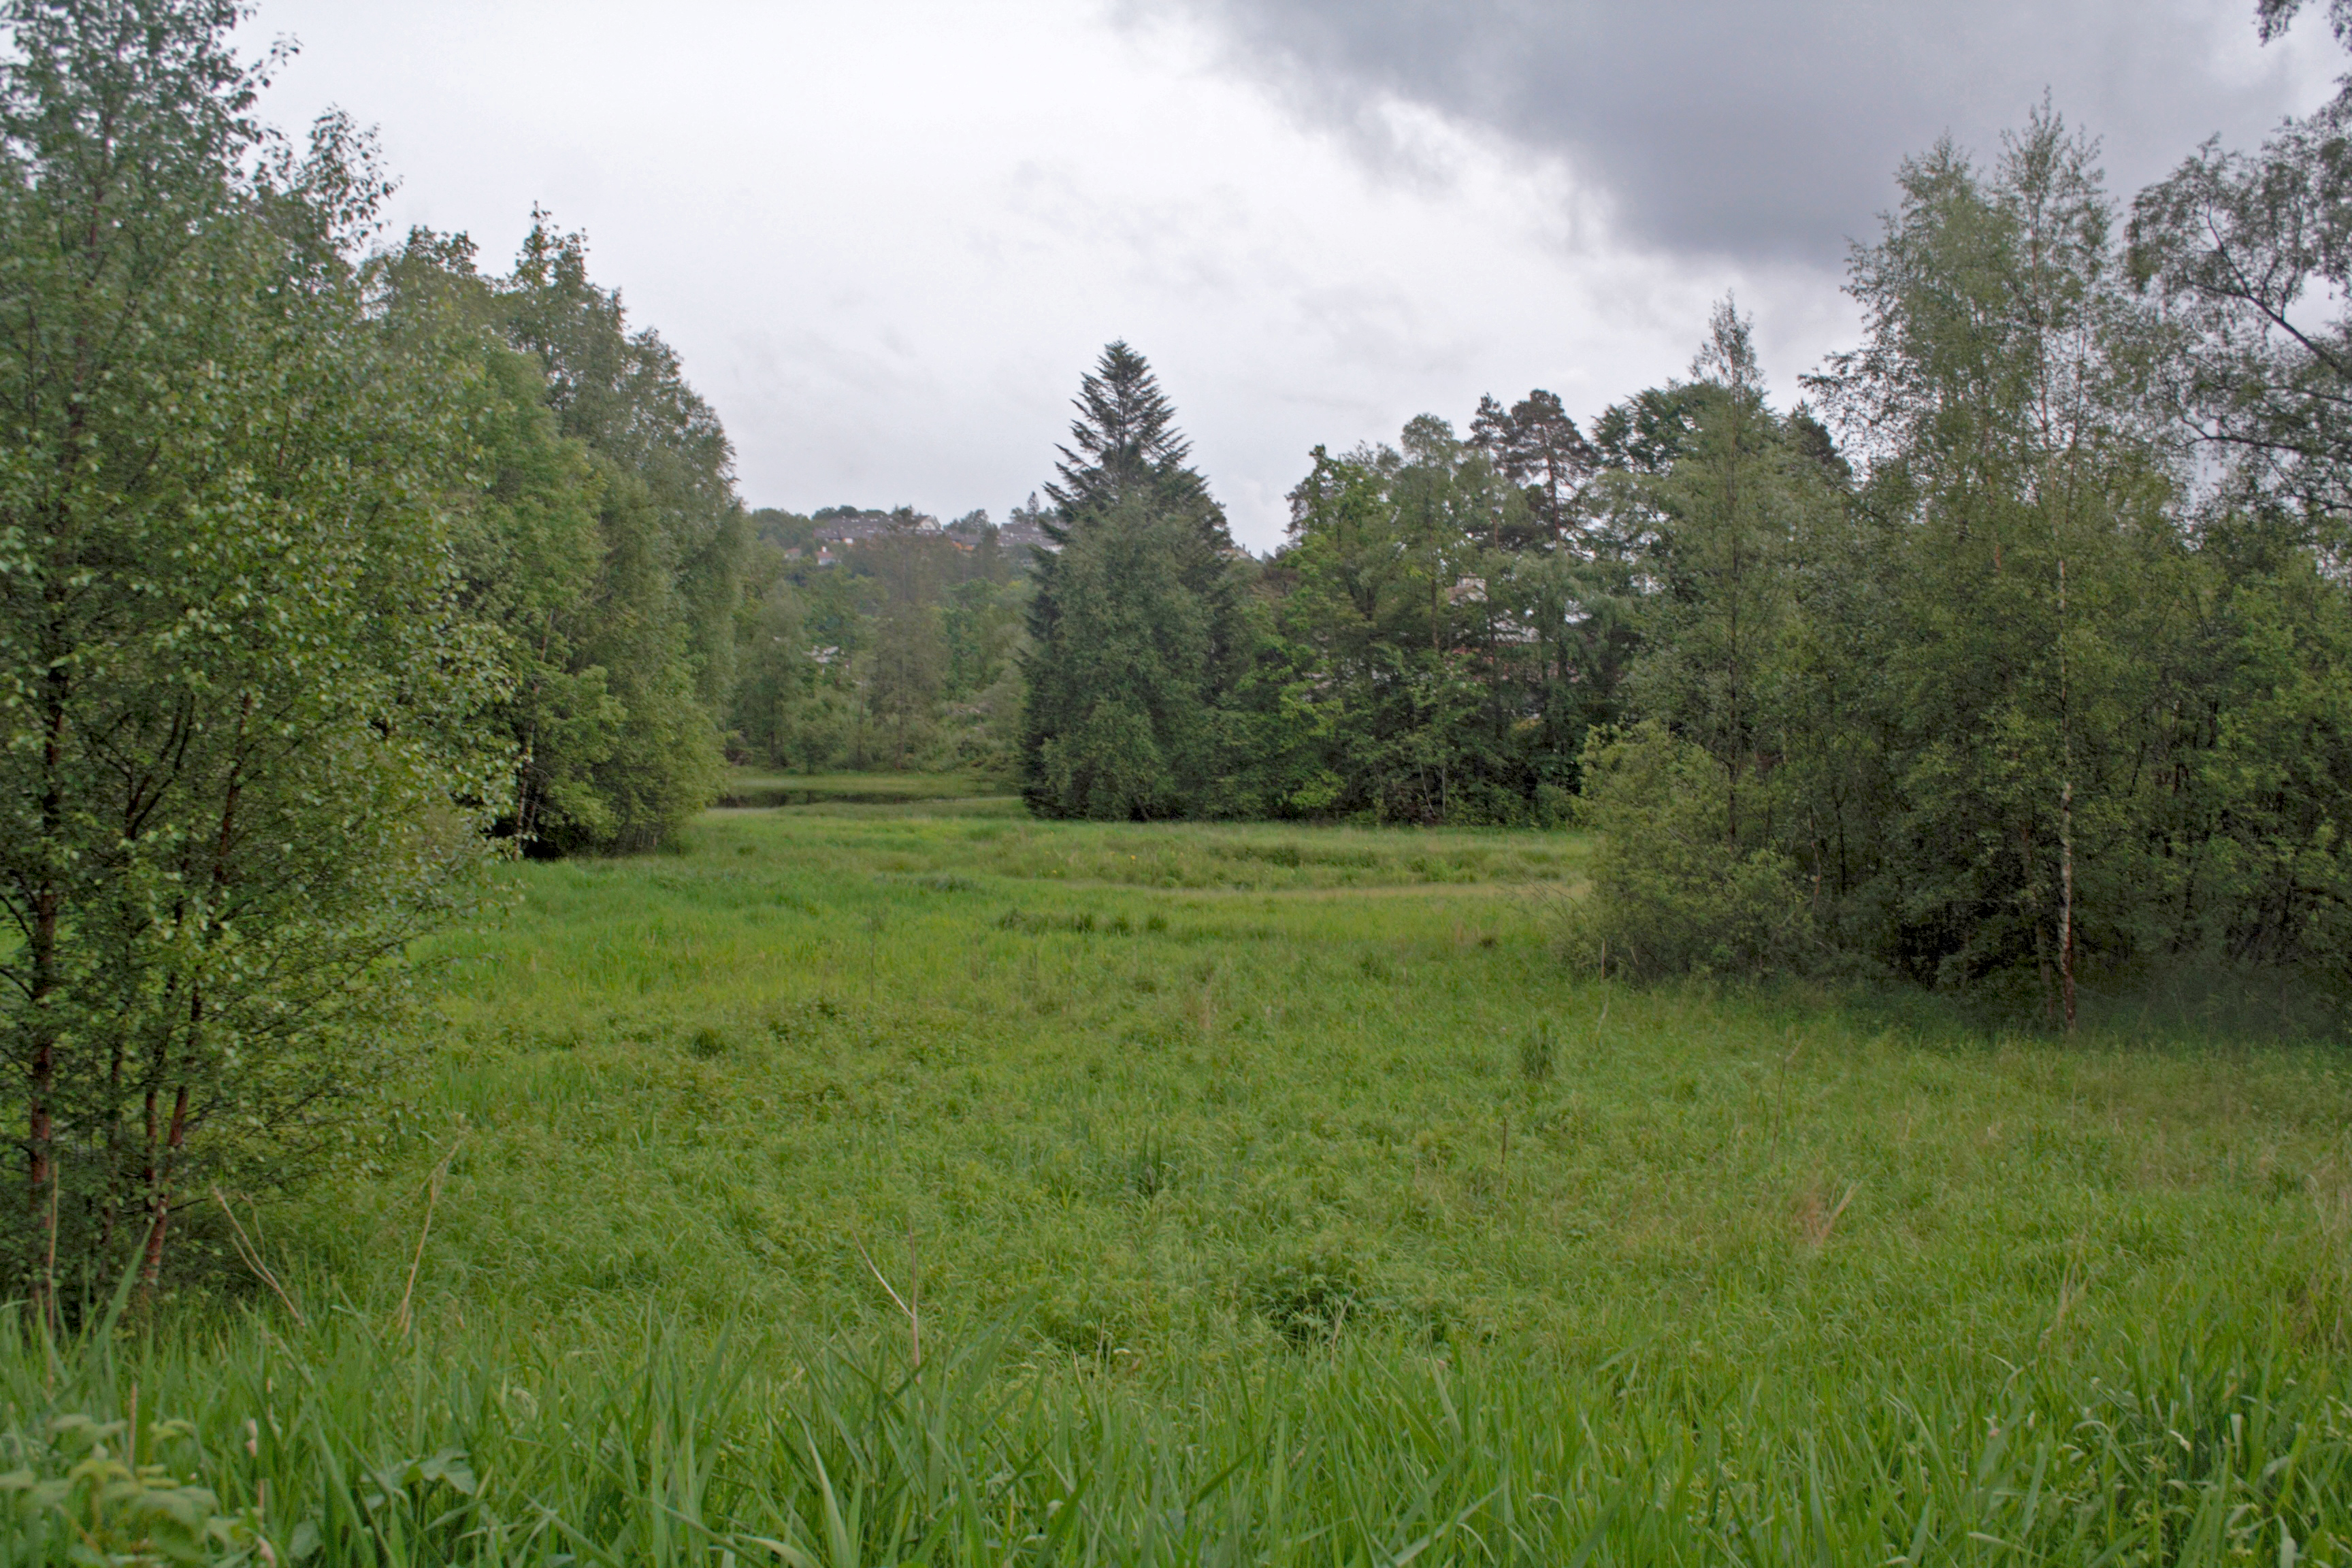 Ein av lokalitetene der Gunnar samla (foto: G.M. Kvifte).